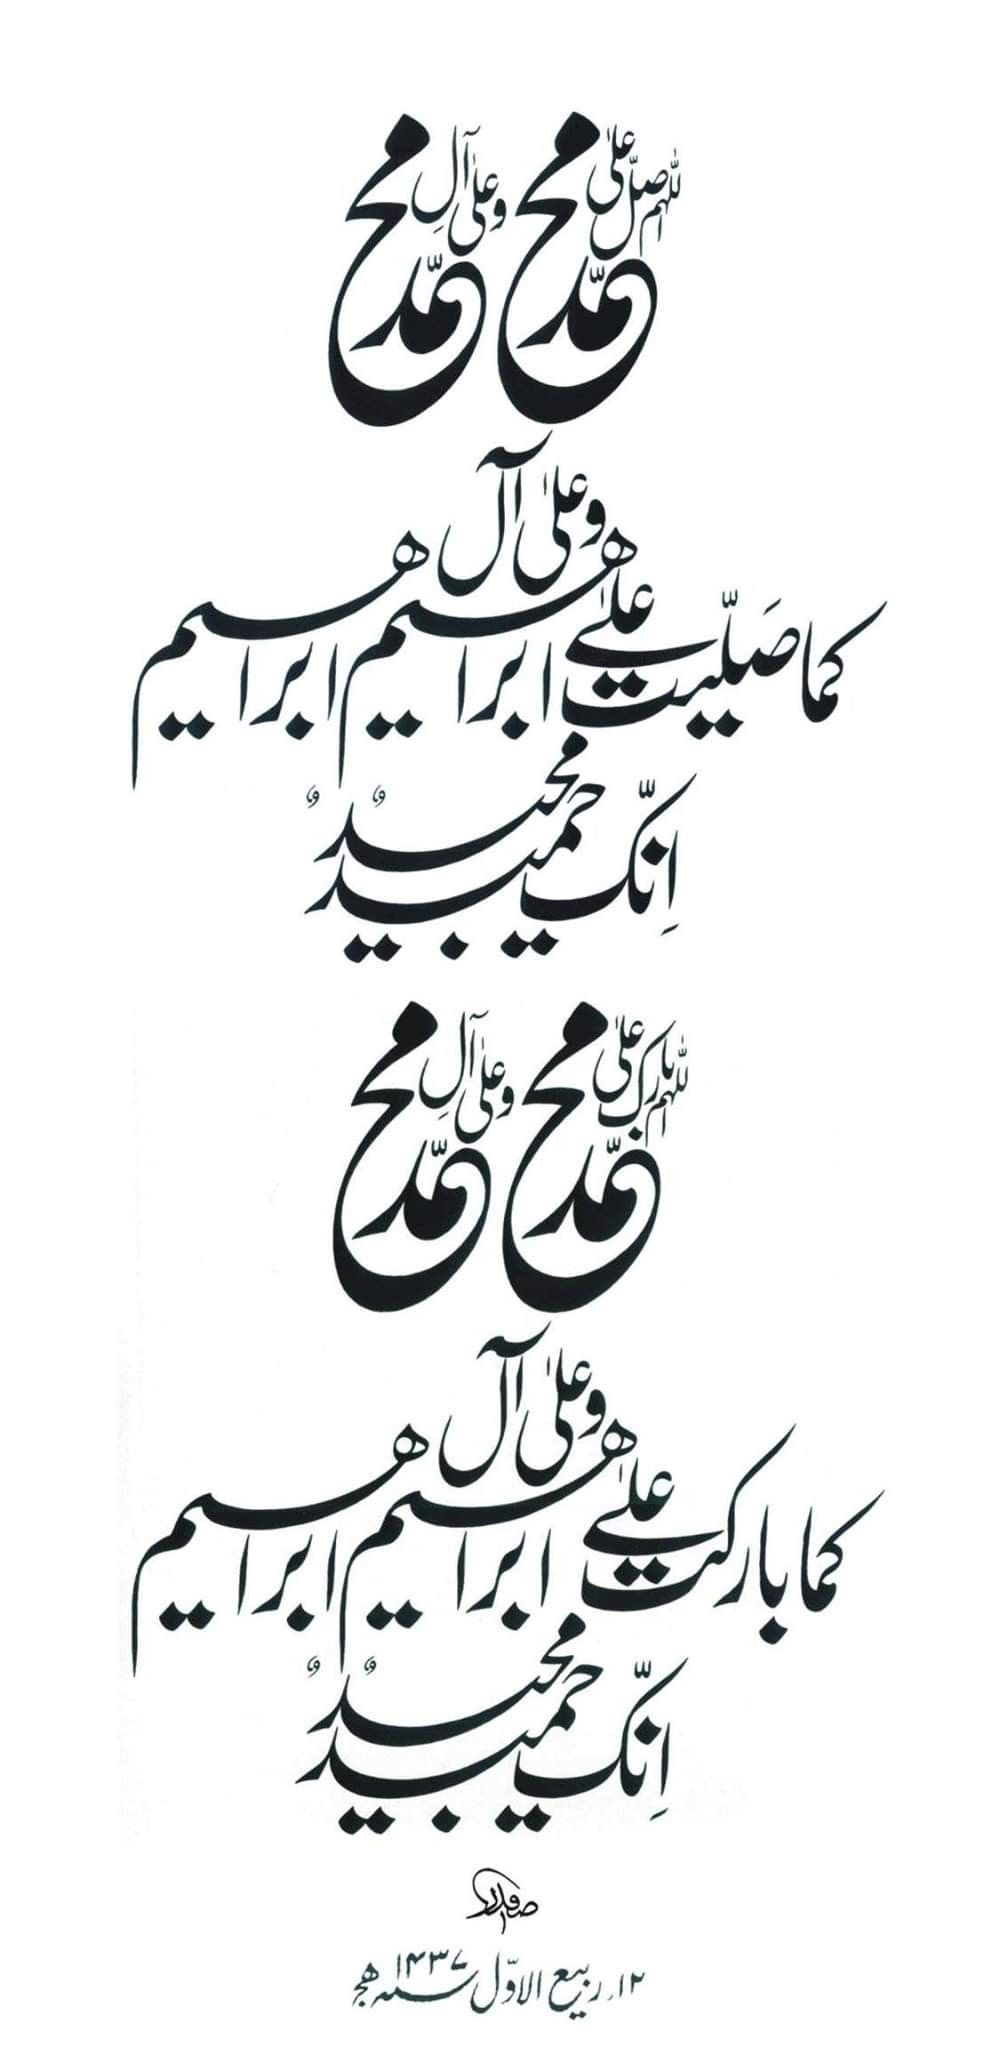 Pin By Masoom Quadri Al Kazmi On فارسی نستعلیق خطاطی In 2020 Calligraphy Arabic Calligraphy Art